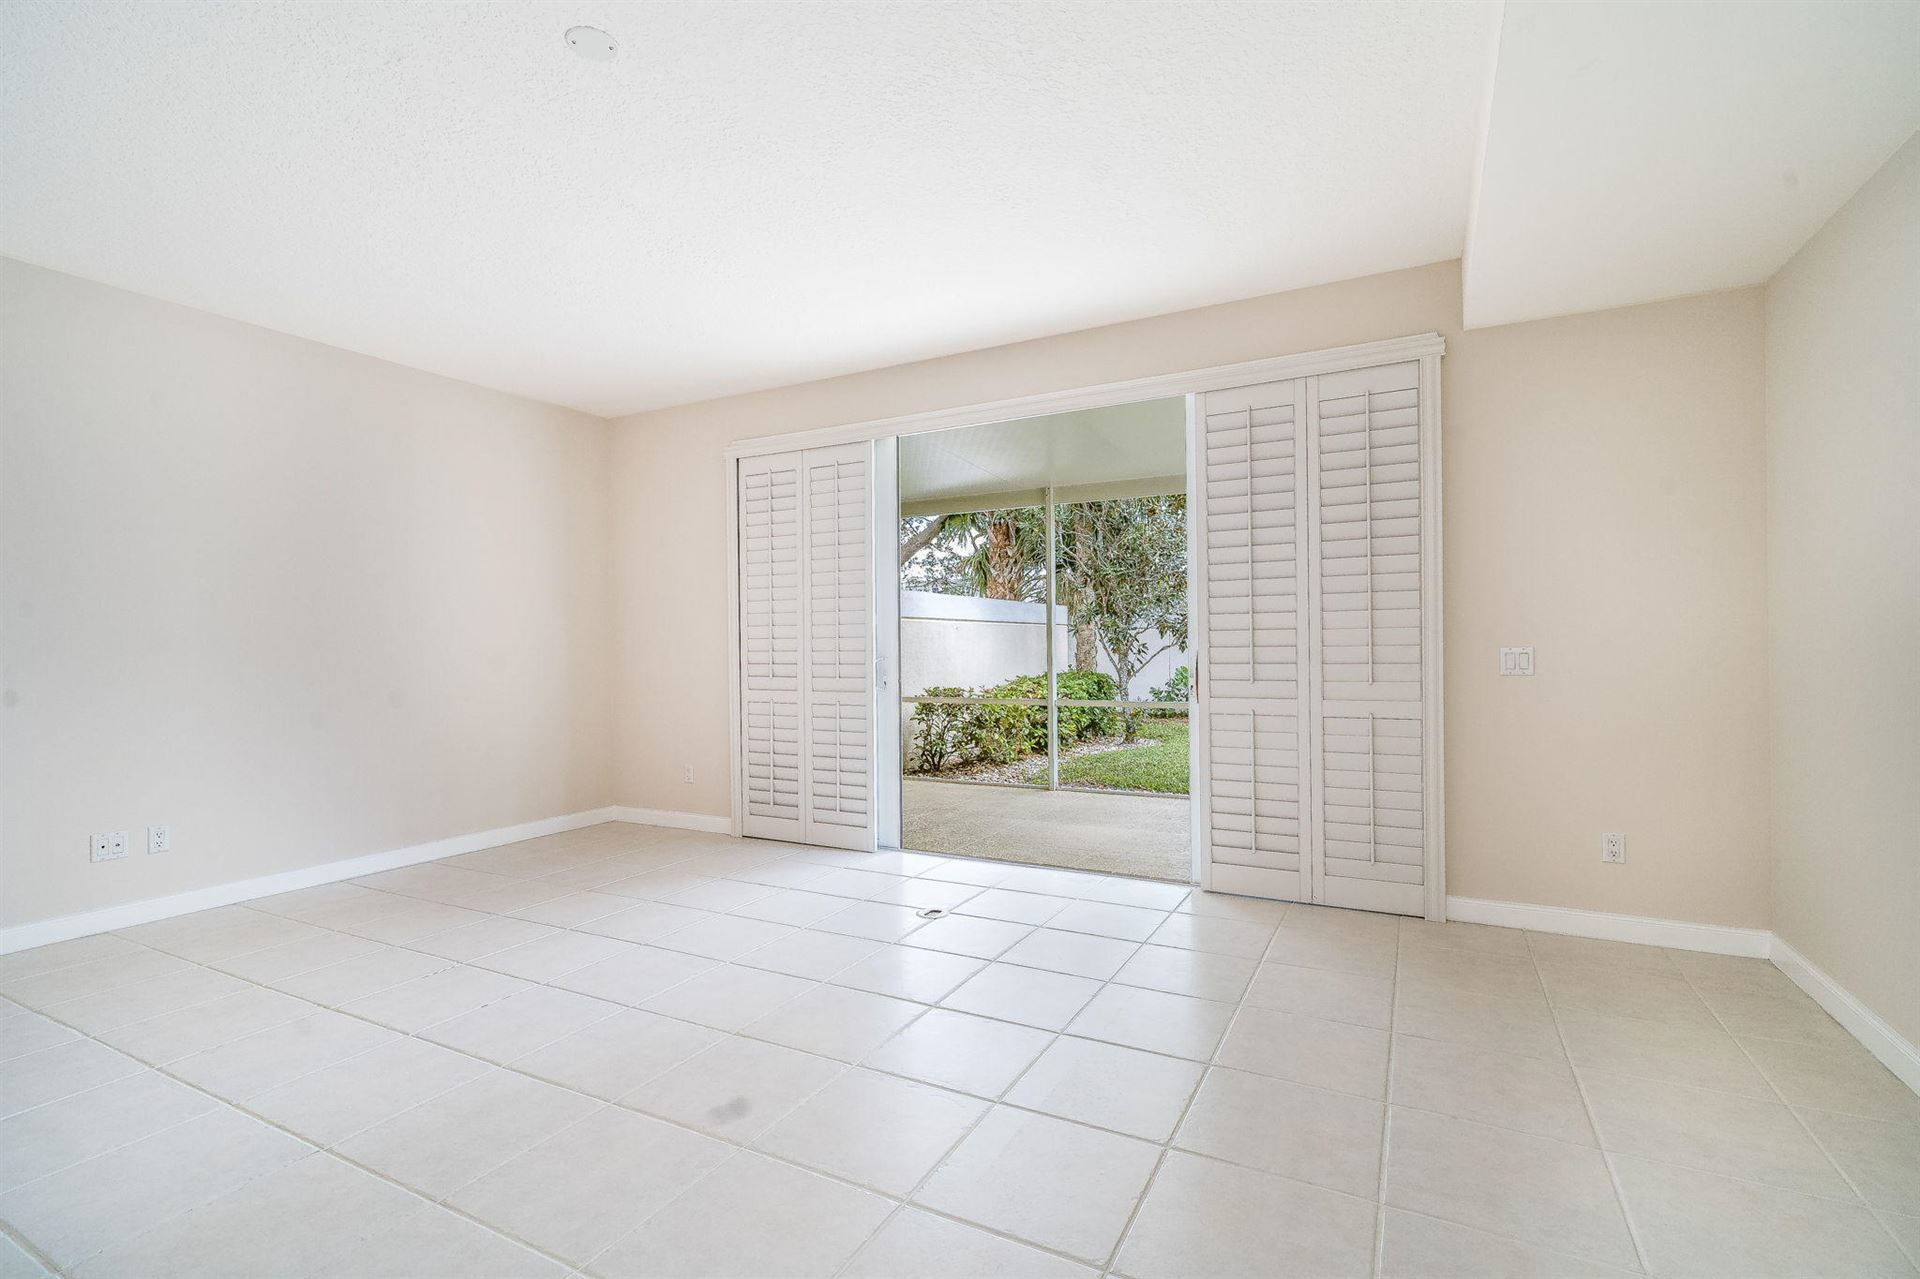 Photo of 180 Santa Barbara Way, Palm Beach Gardens, FL 33410 (MLS # RX-10686132)